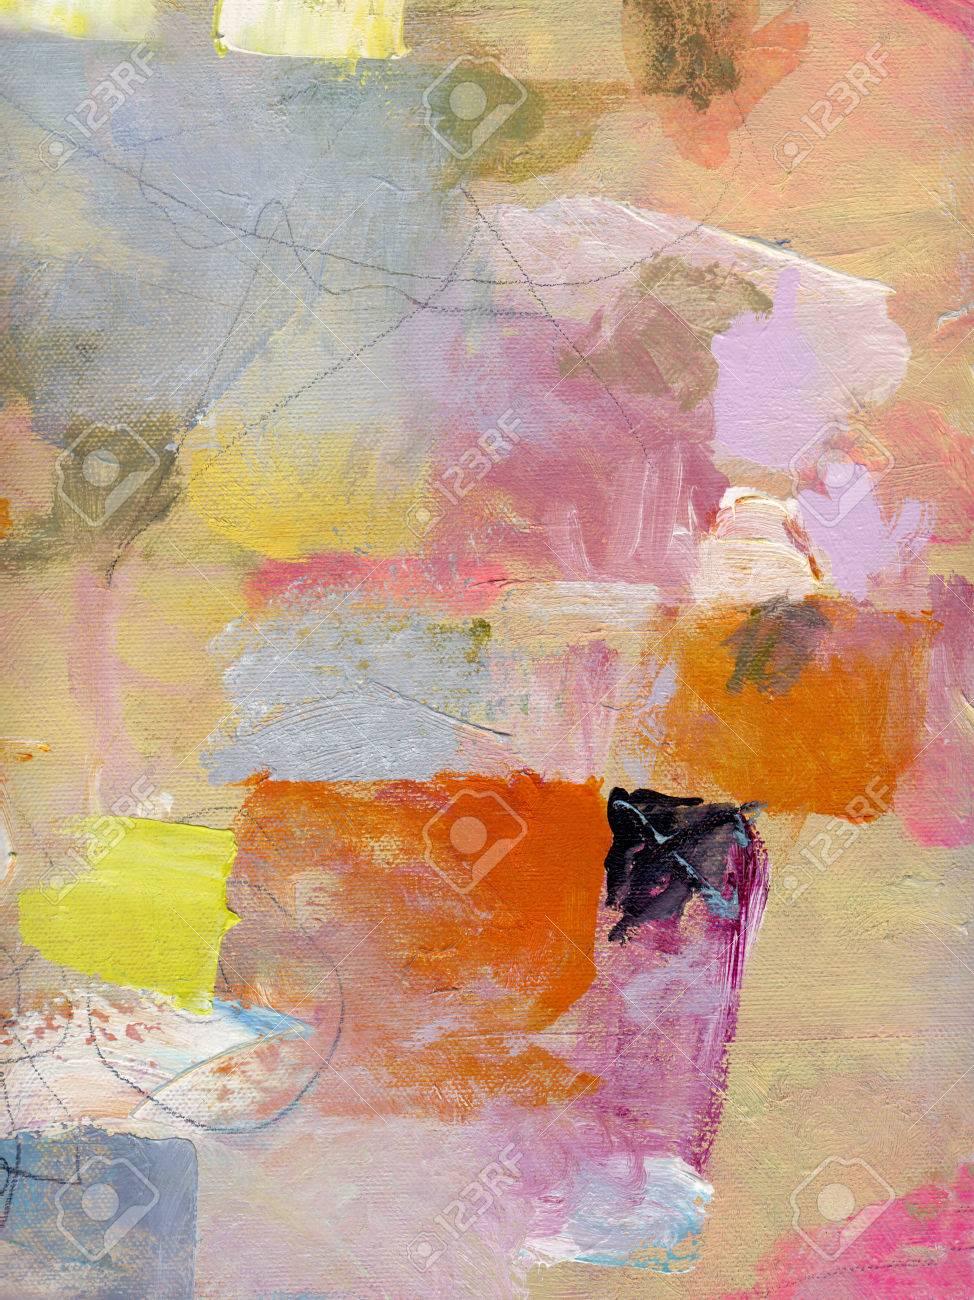 Abstrait Multicolore Couche ?uvre, Opaques